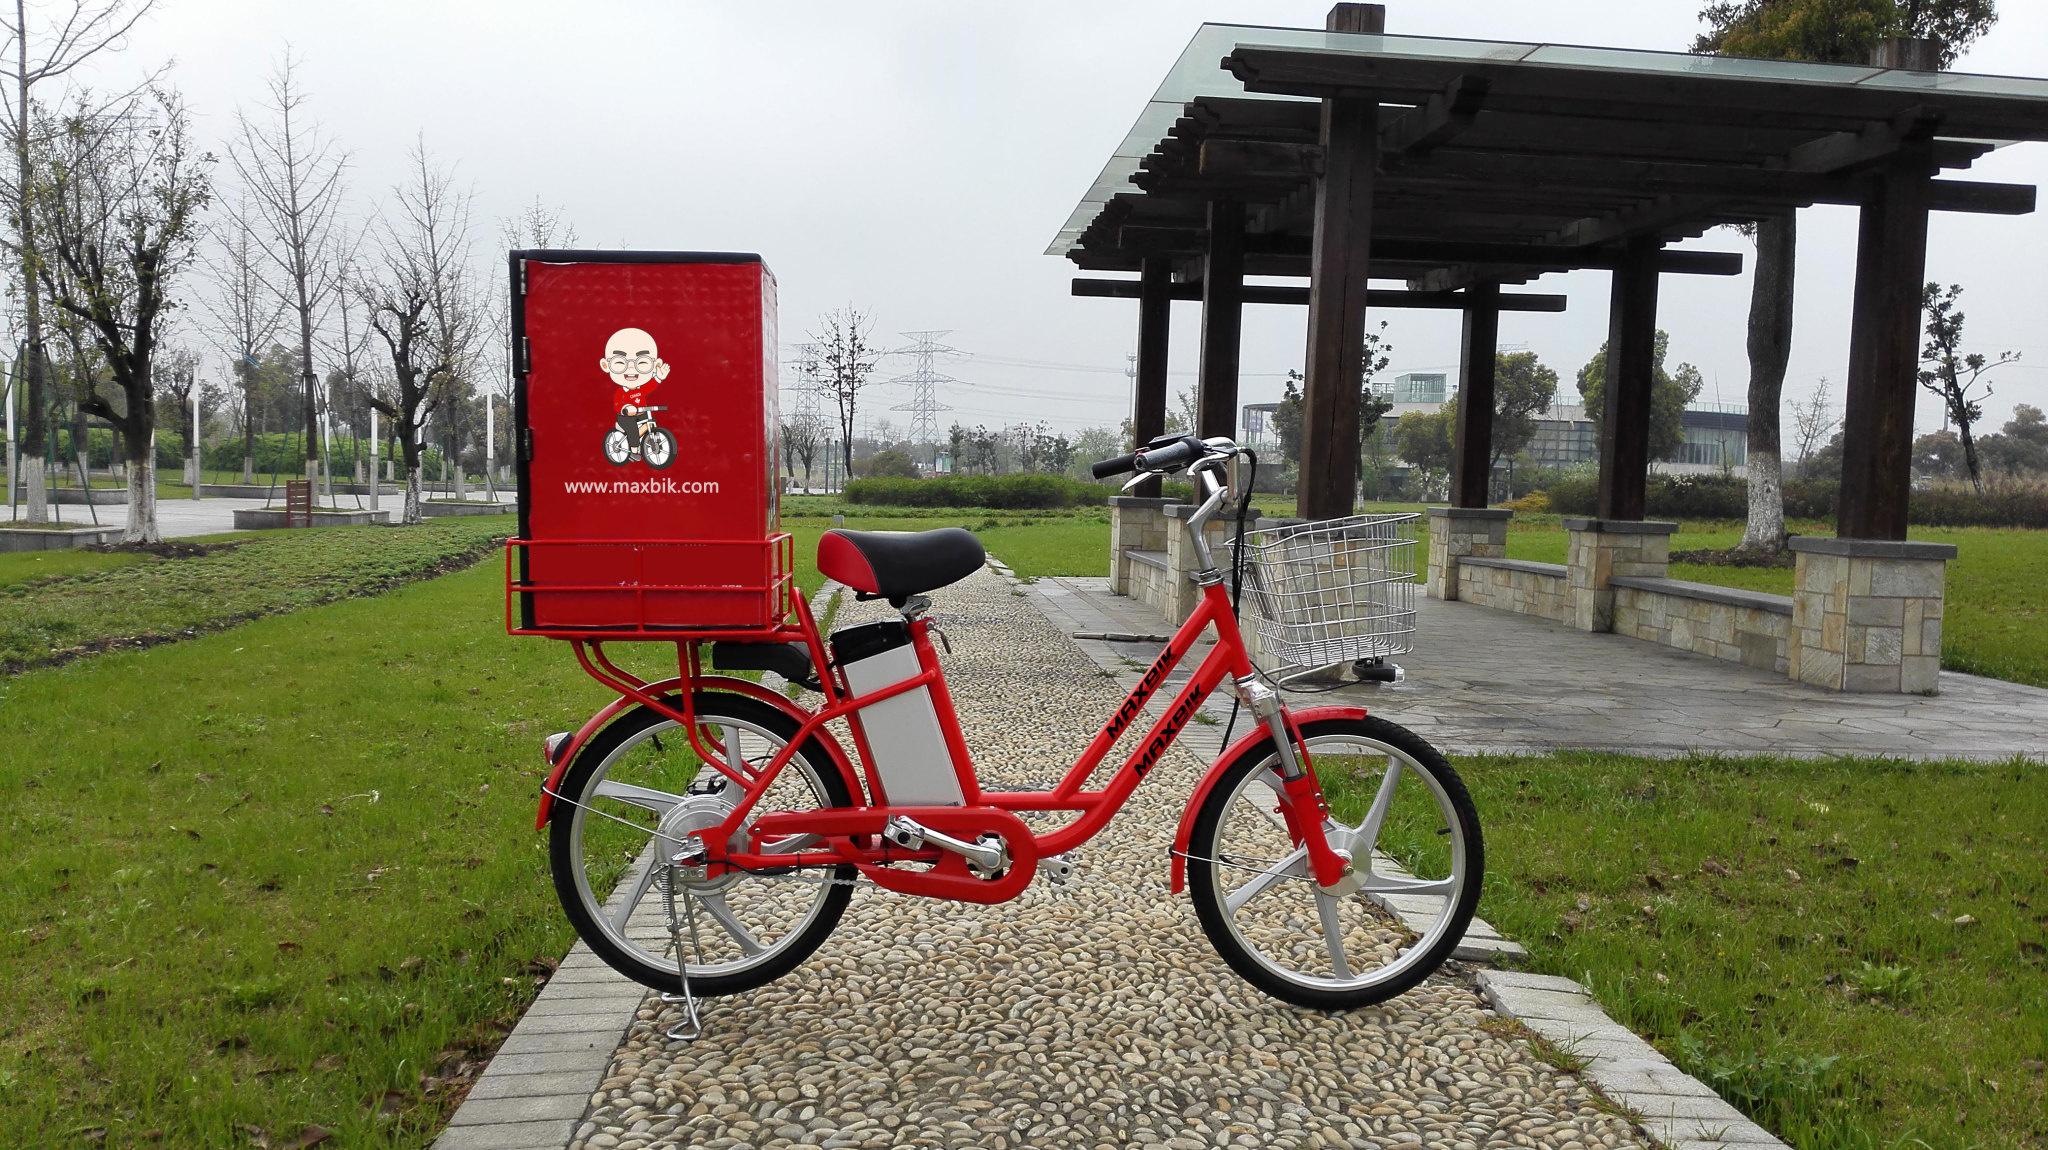 "Maxbik Maxbik MX-35 Electric Bike Delivery Ebike 22"""